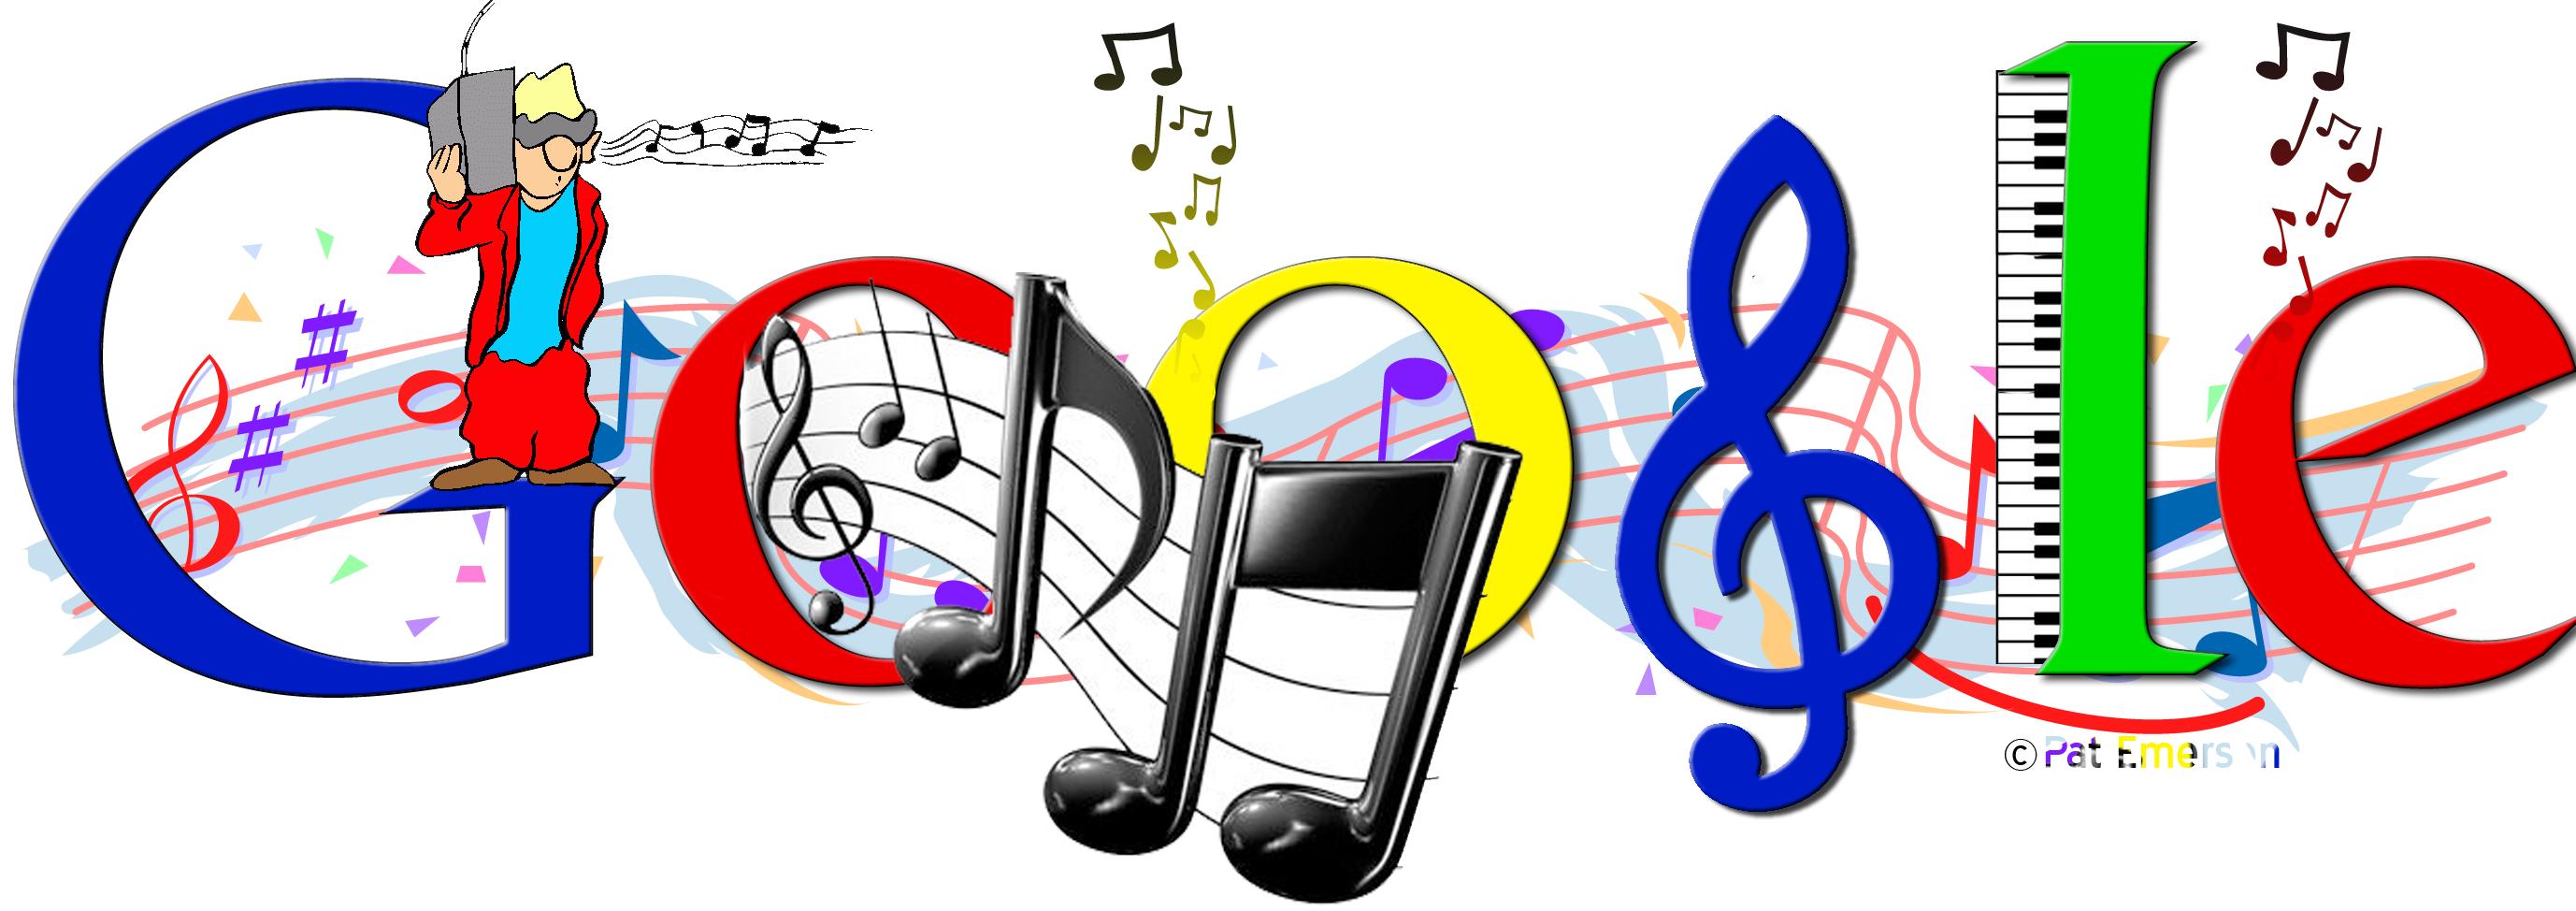 Google themes doodle - Google 35 Outstanding Google Logos Google Doodle Rapidlikes Com